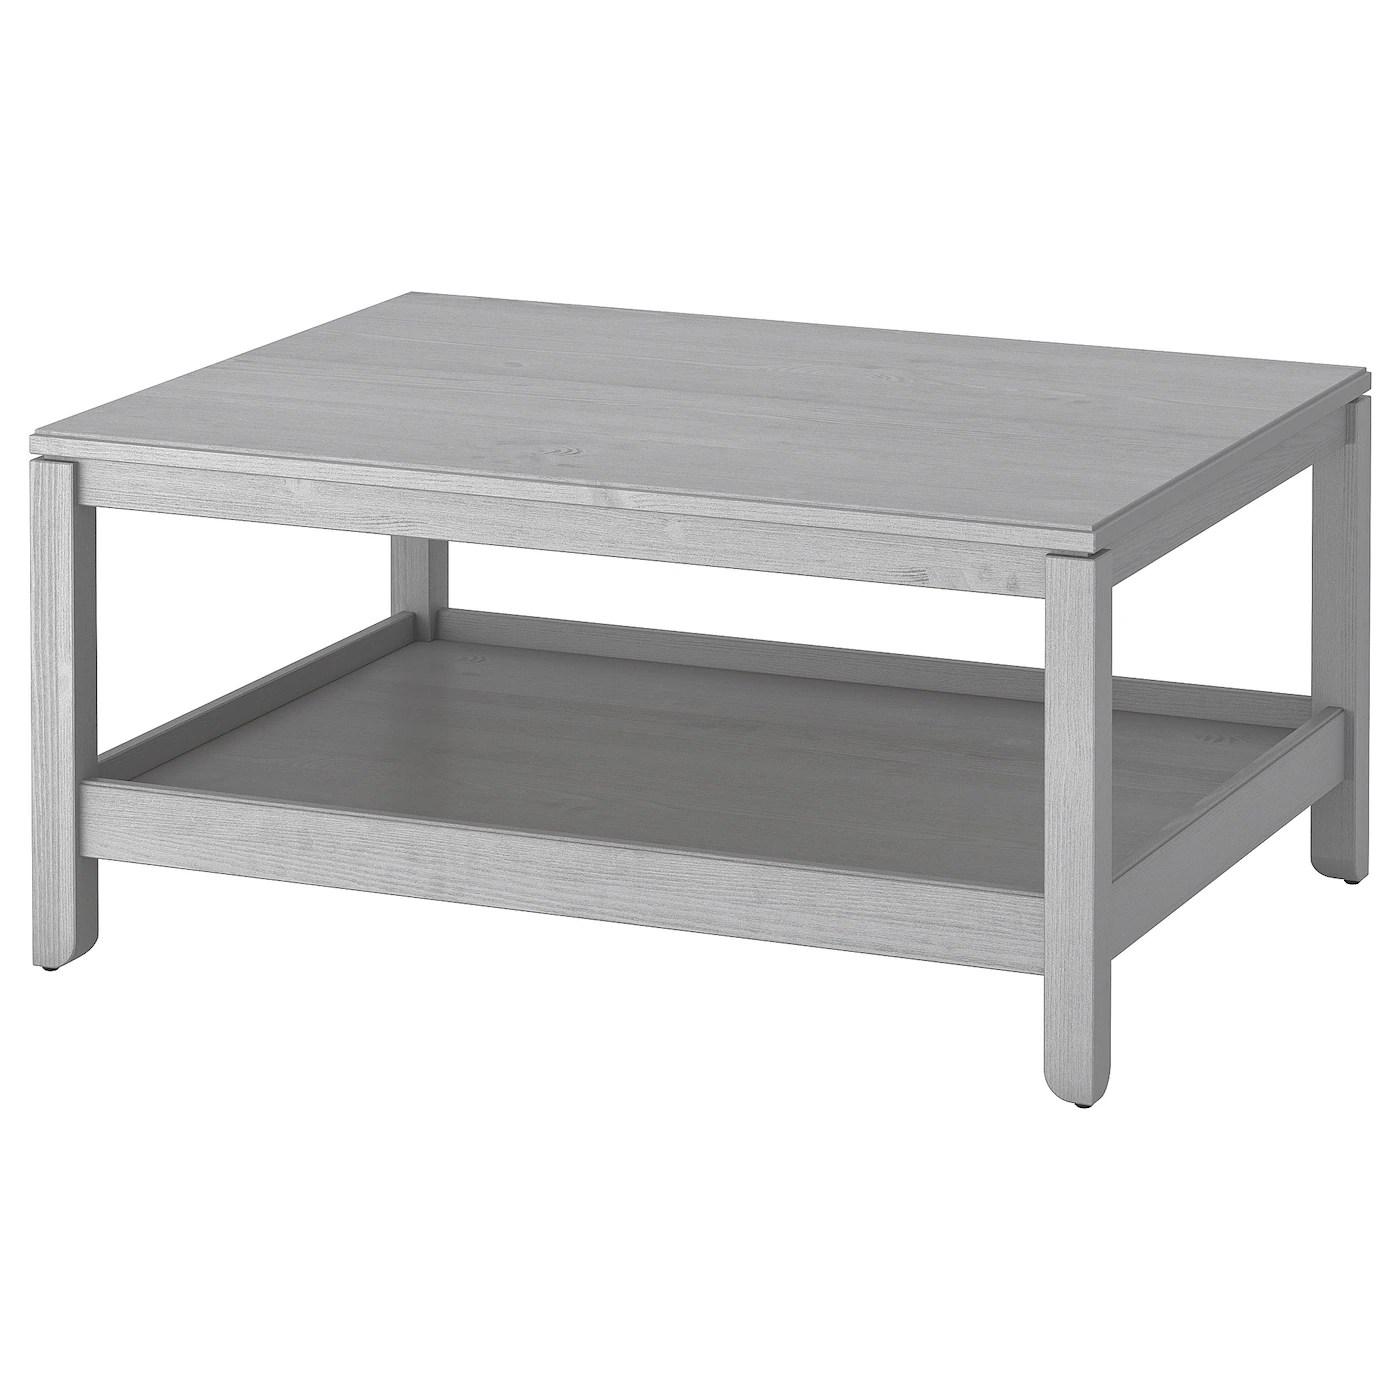 havsta table basse gris 100x75 cm